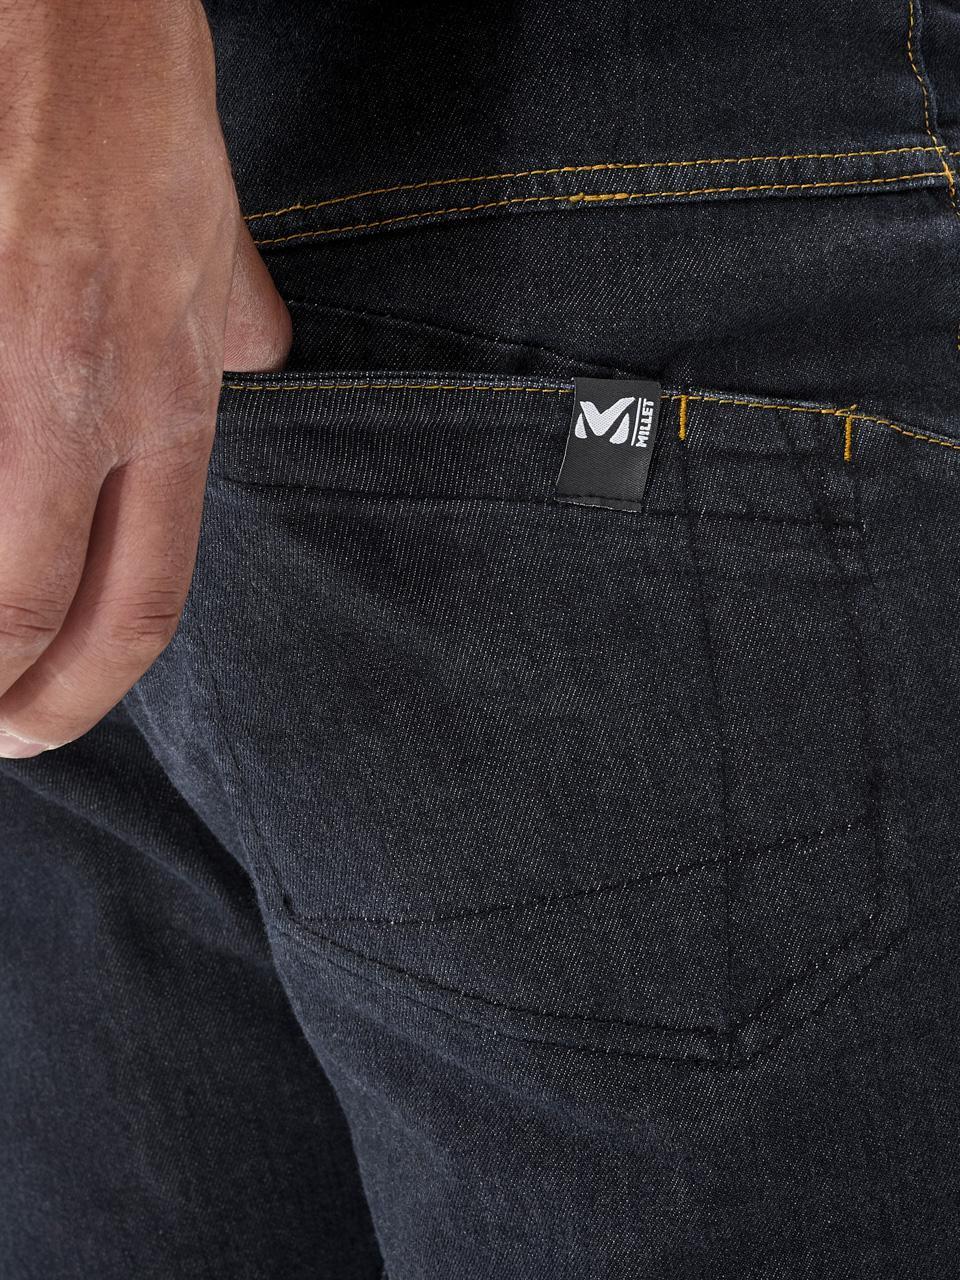 Hose-Jeans-Millet-Karambony-Hose-Denim-Dunkel-Blau-15043-Neu Indexbild 4